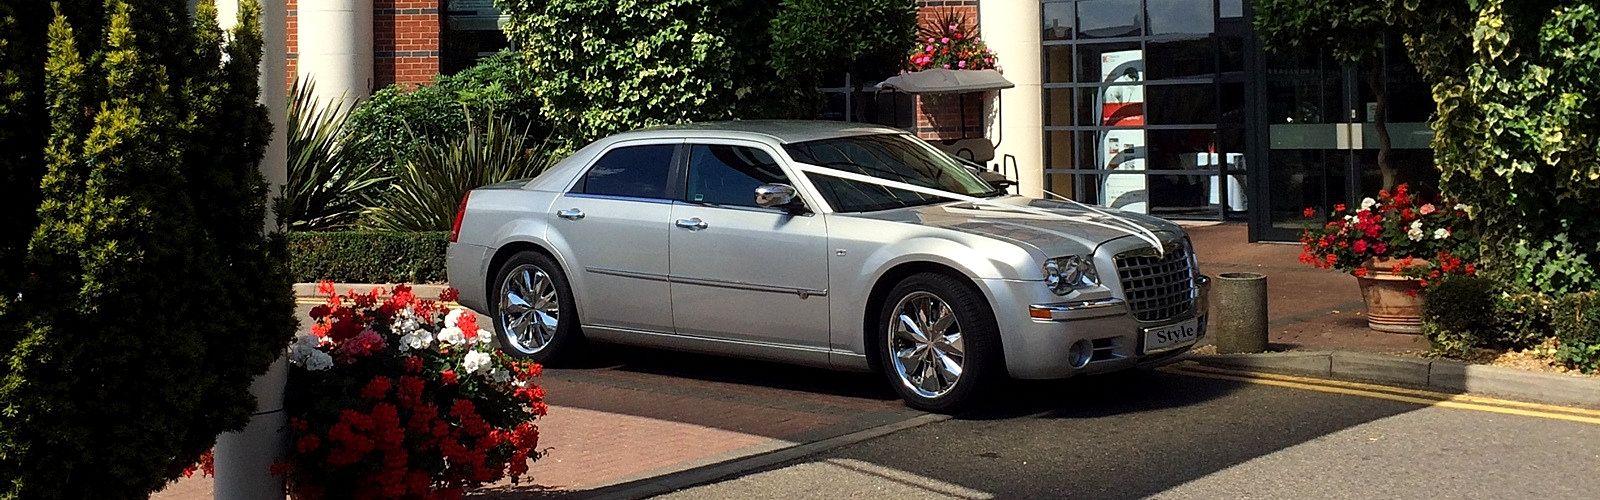 Limo-Style-Wedding-Car